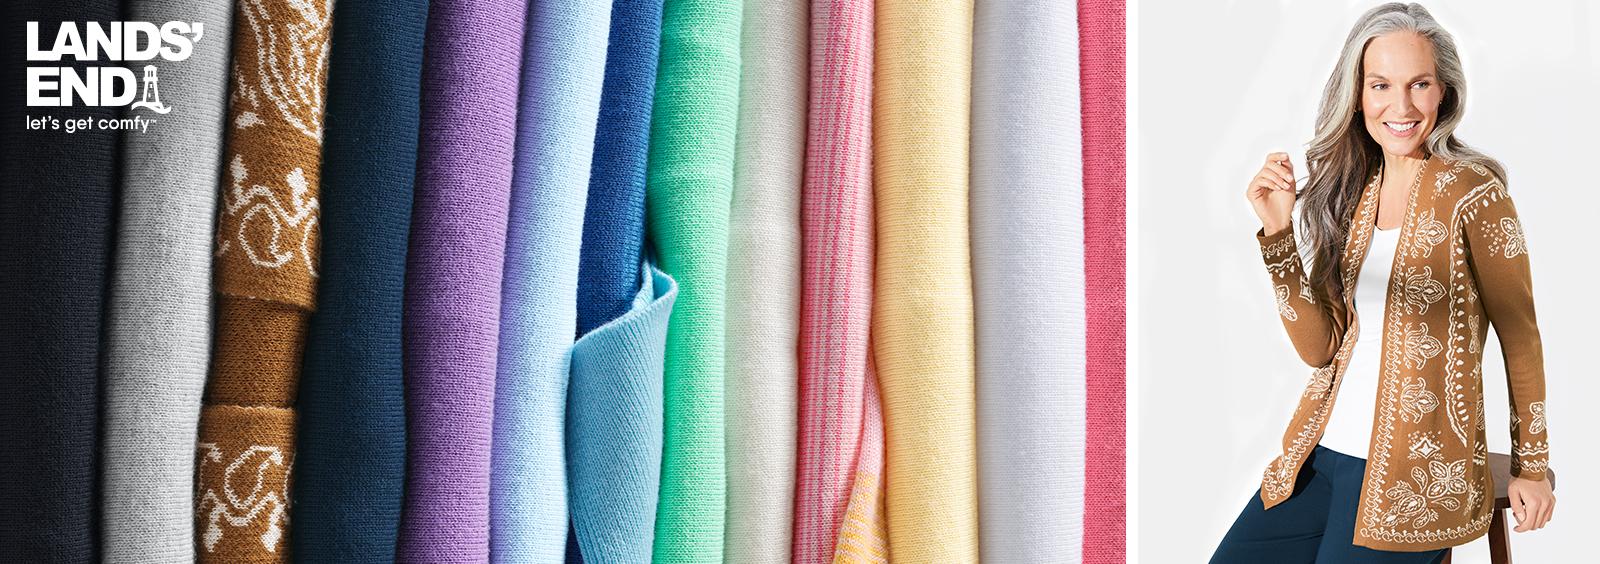 7 Ways to Wear Your Favorite Cardigan